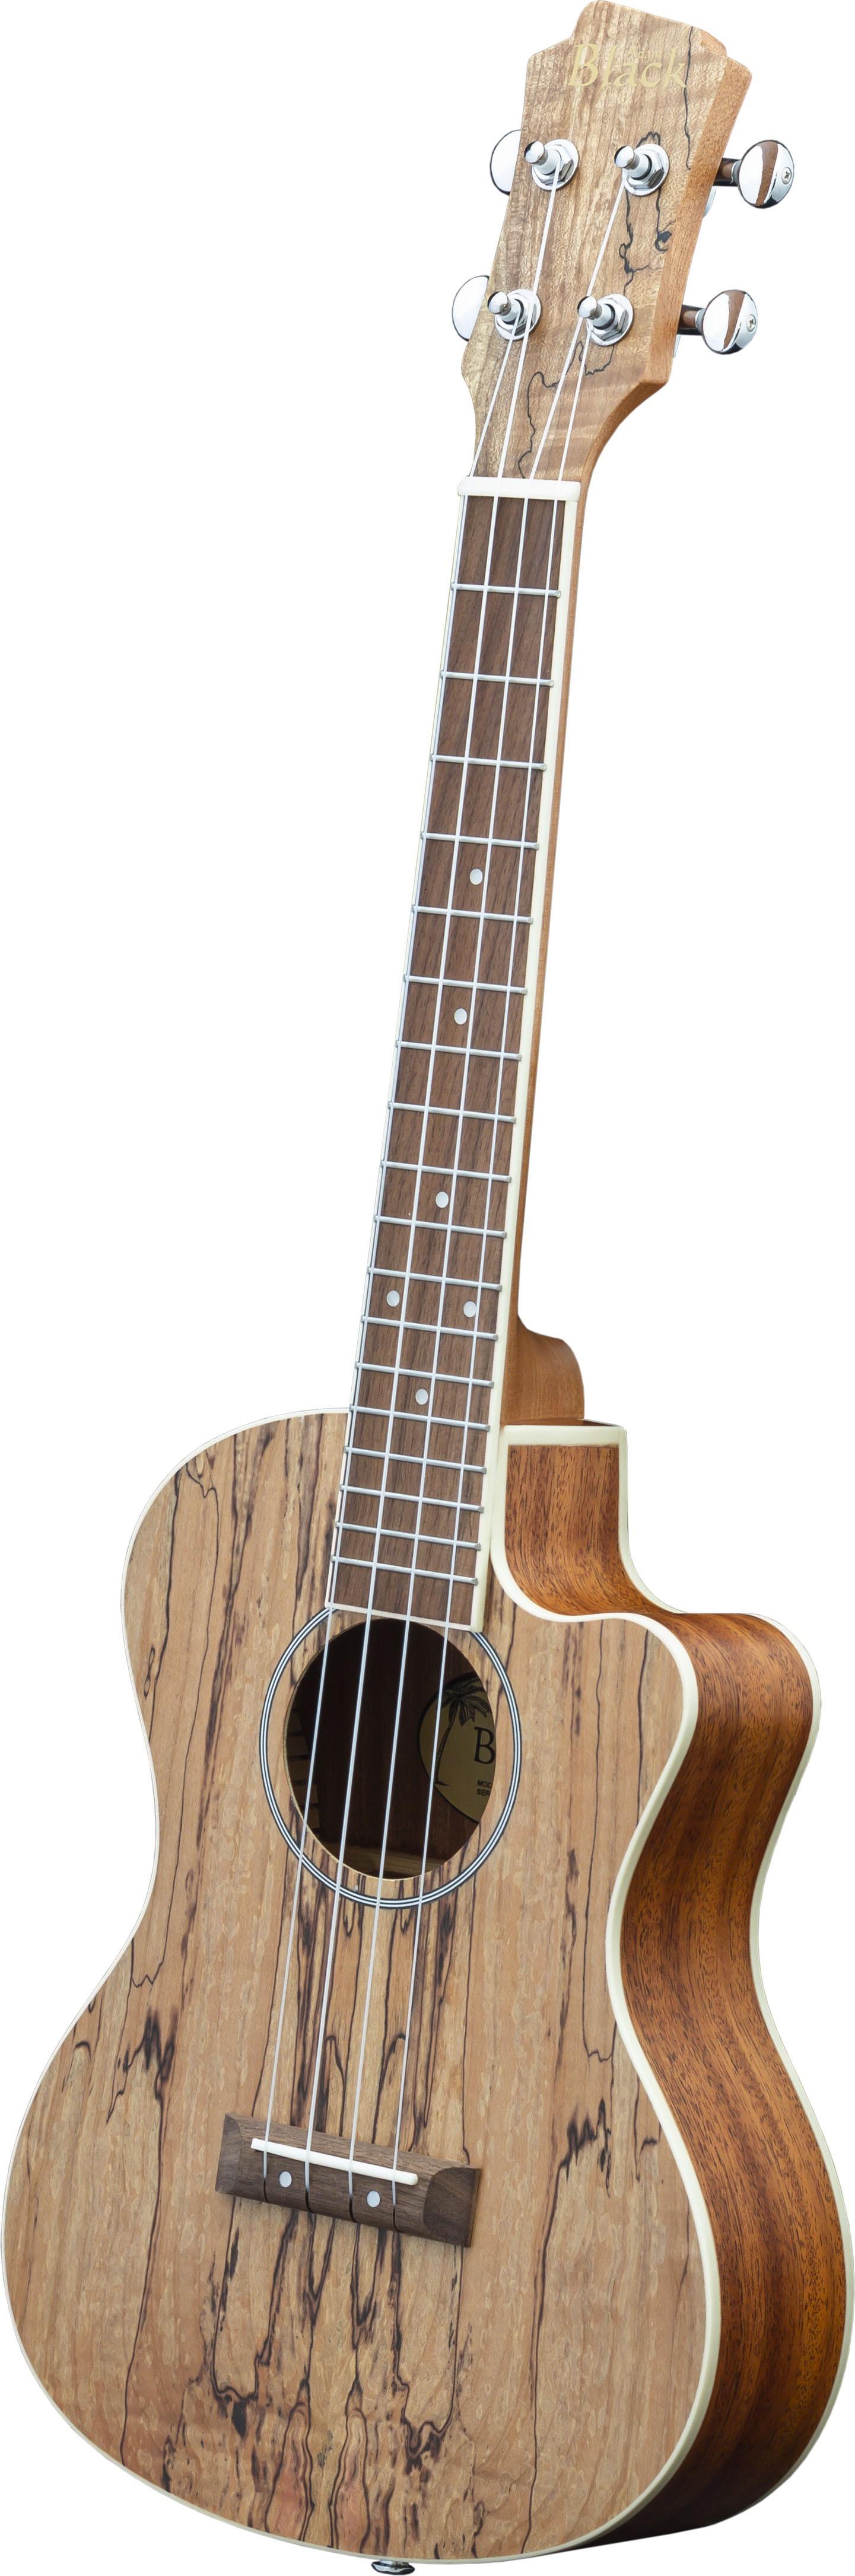 Adam Black Exotic Wood Series Tenor CE Ukulele - Spalted Maple